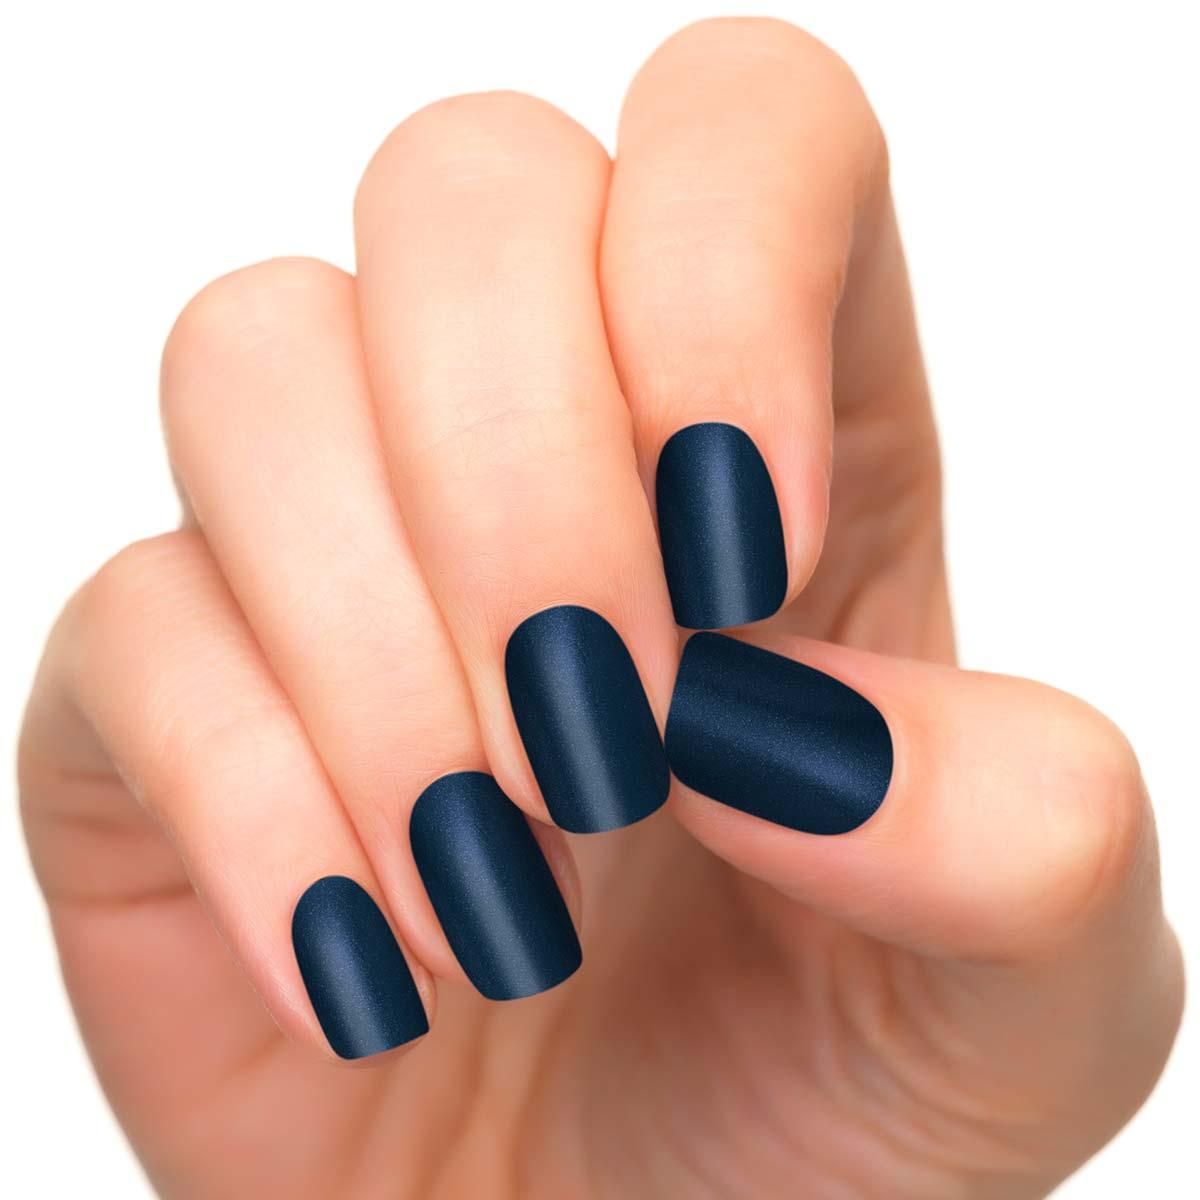 vernis a ongle bleu marine